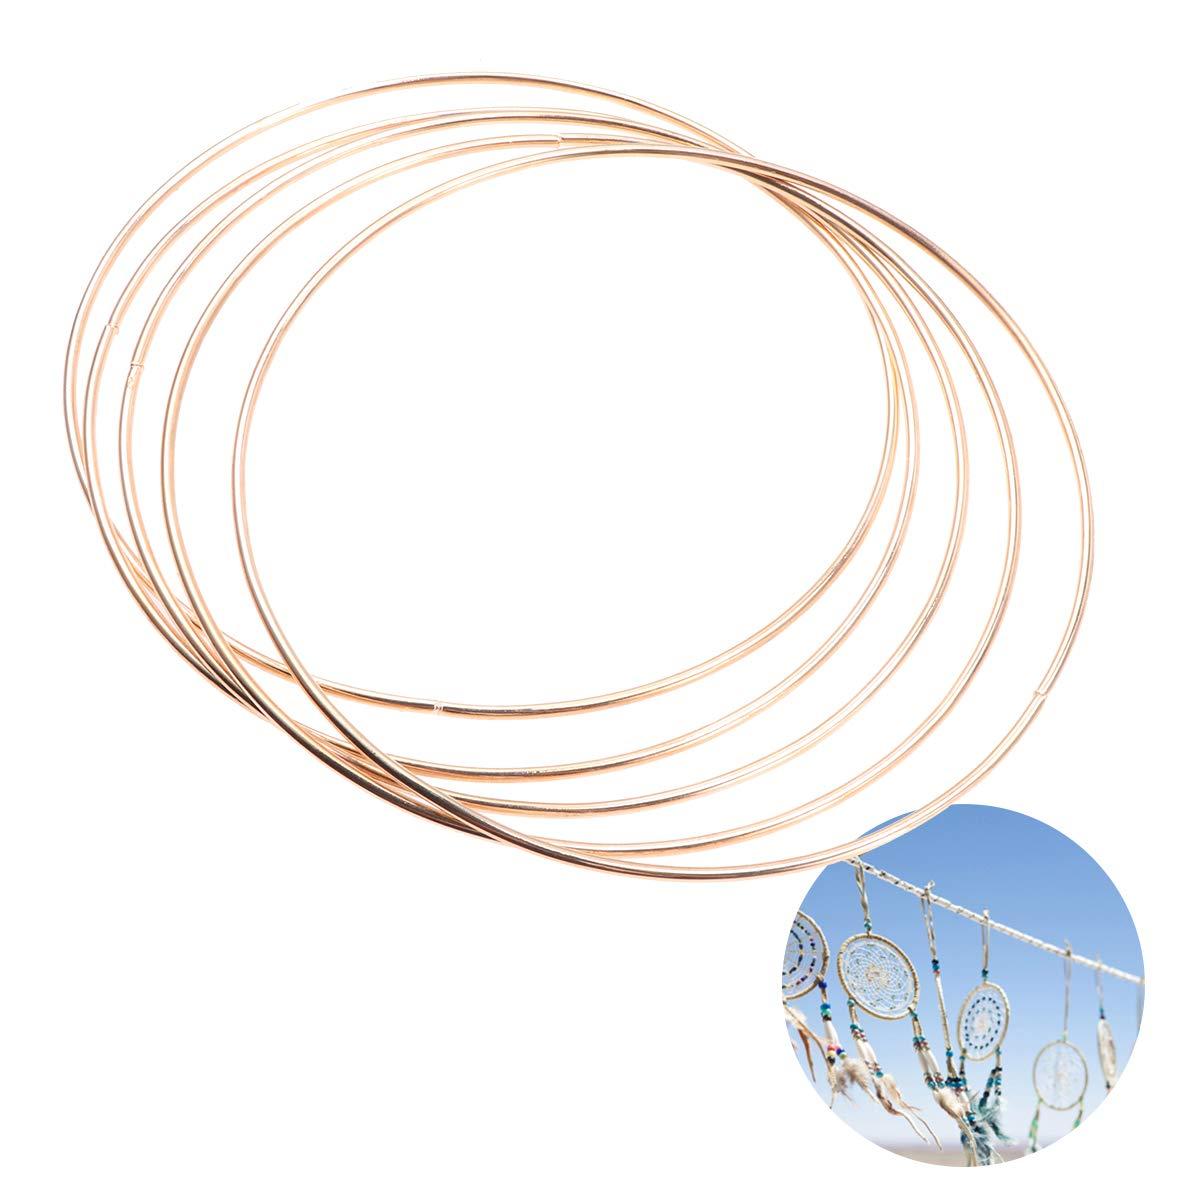 Makramee Ring St/ärke ca Rayher 2505006 Metallring Floristik f/ür Wickeltechnik Drahtring zum Basteln 10 cm /ø gold beschichtet Traumf/änger Ring 3 mm